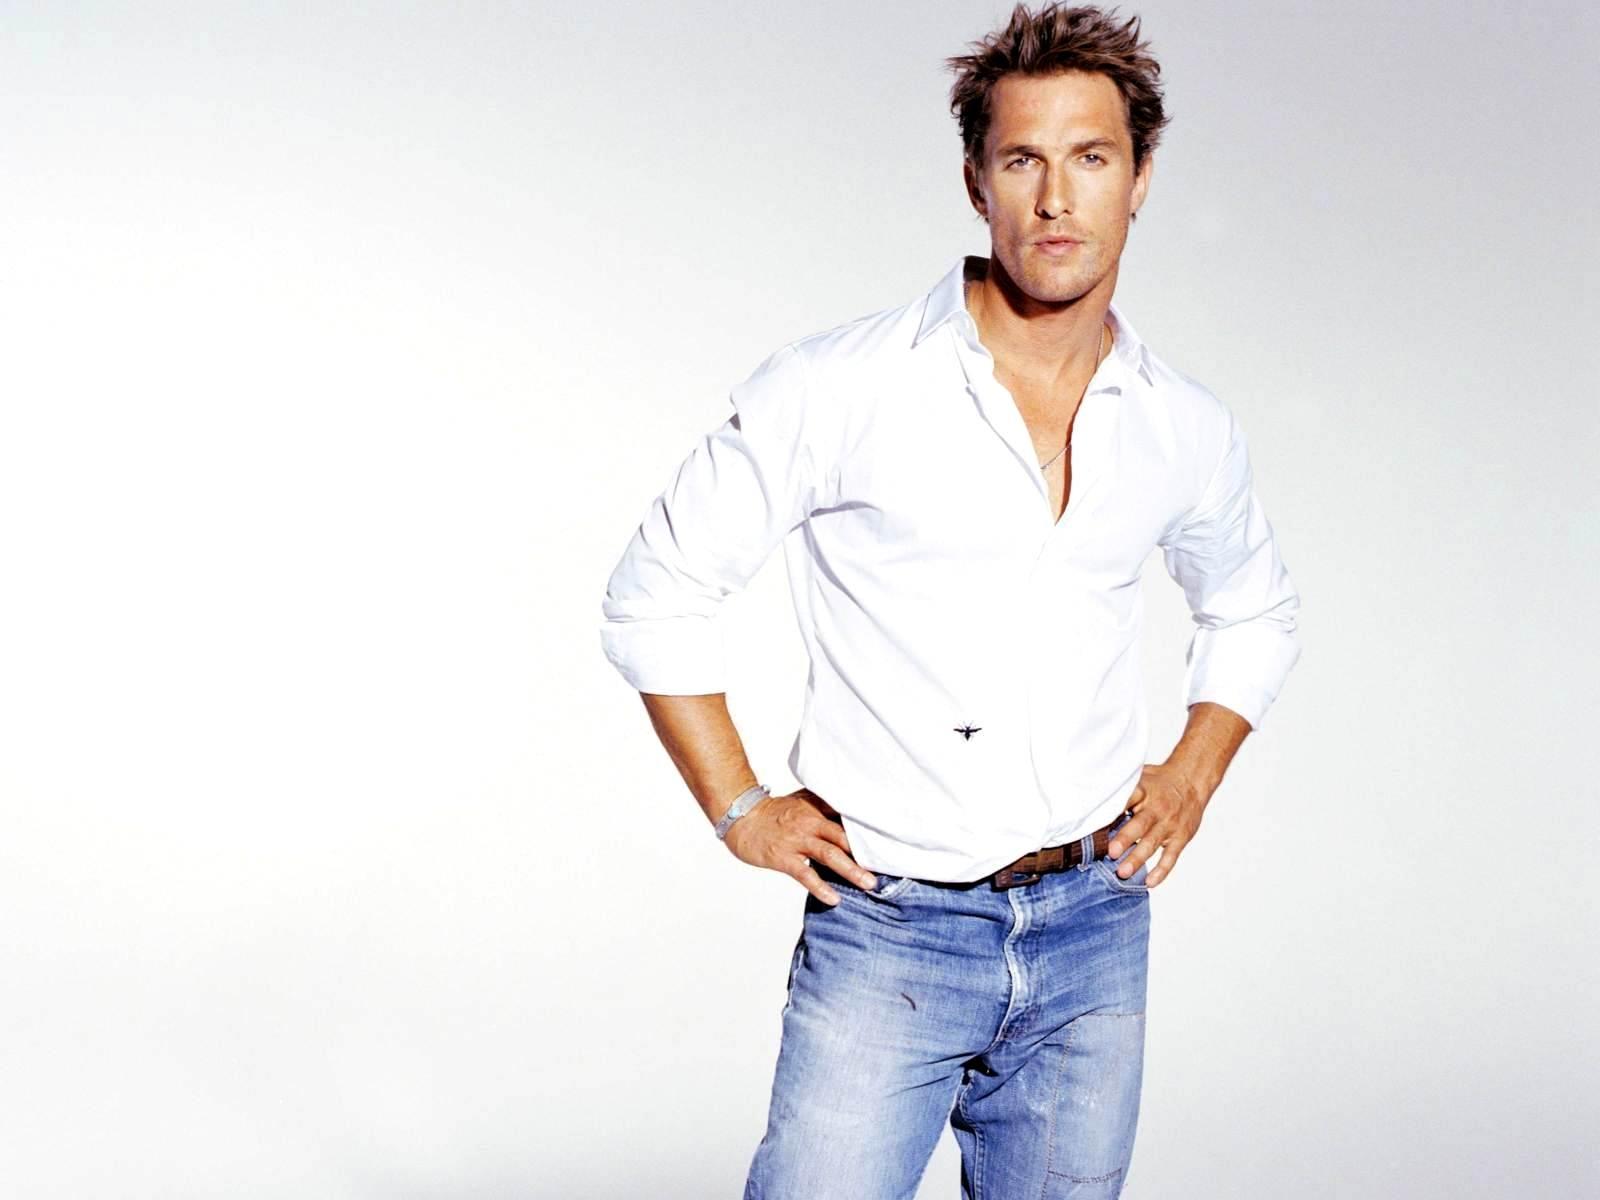 Matthew McConaughey Wallpaper Pictures 56138